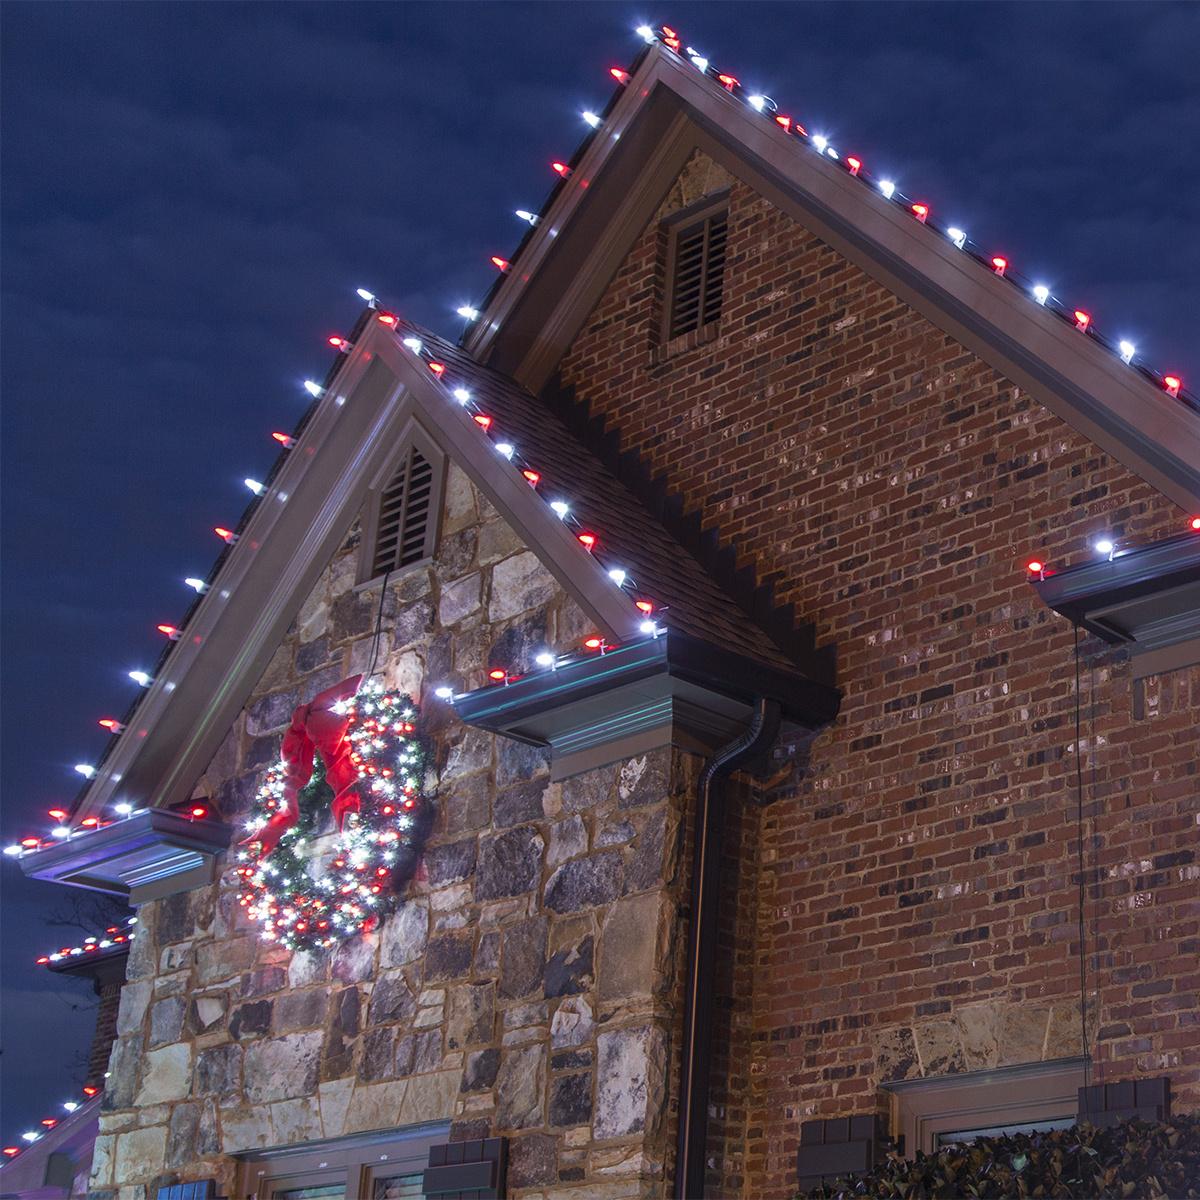 c9-outdoor-christmas-lights-photo-15